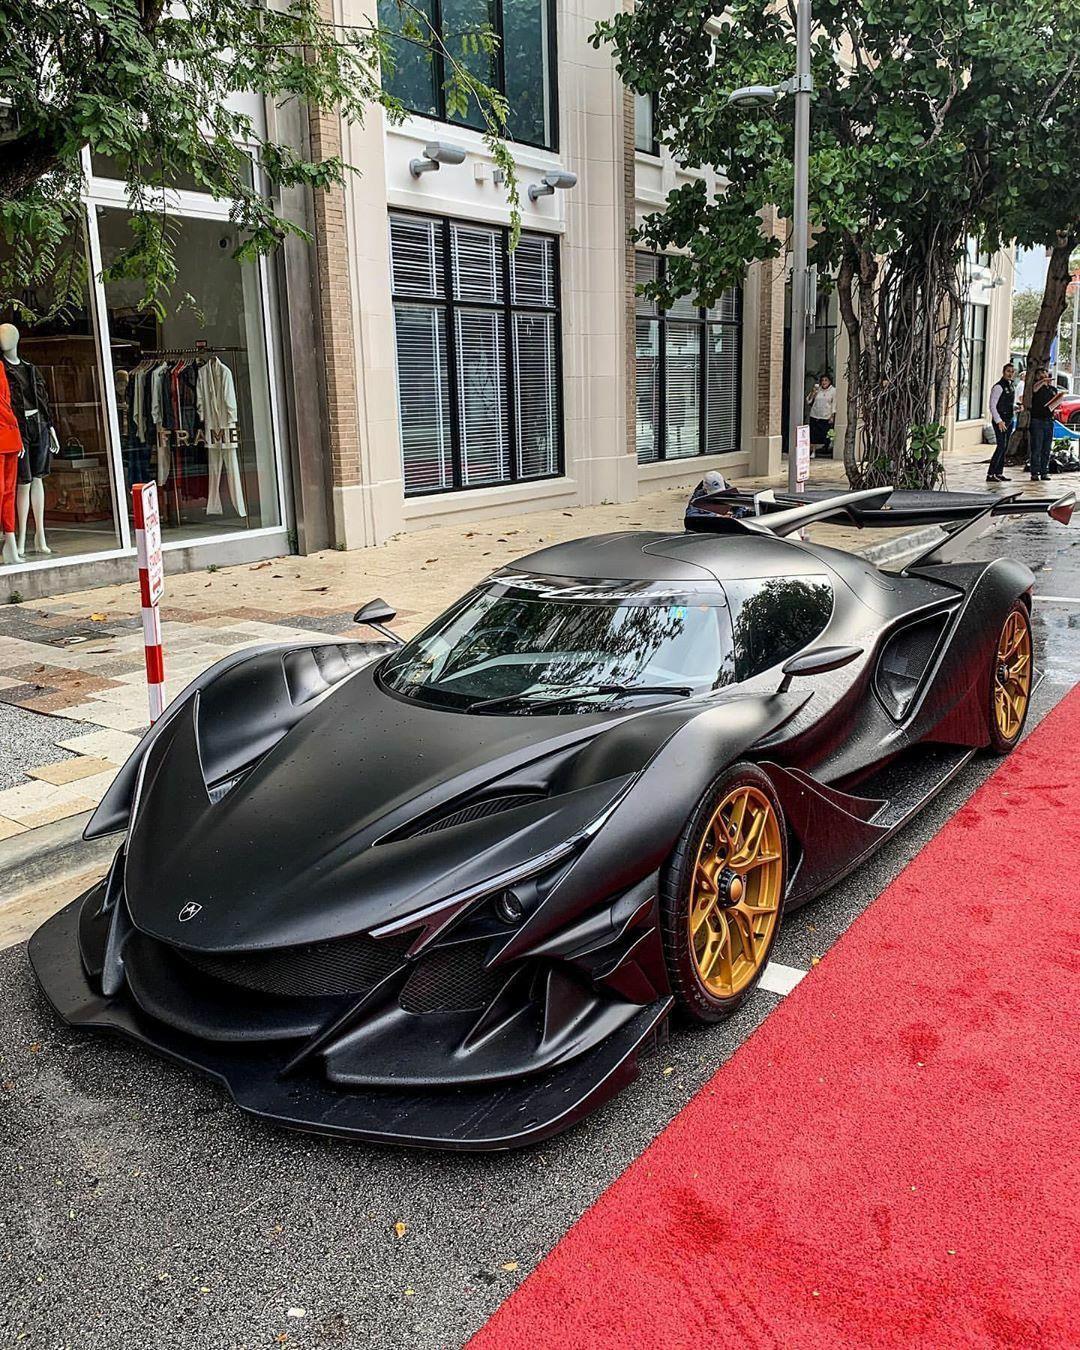 Pin By Esteban Carmillo On Luxury Supercars In 2020 Super Cars Super Sport Cars Apollo Car